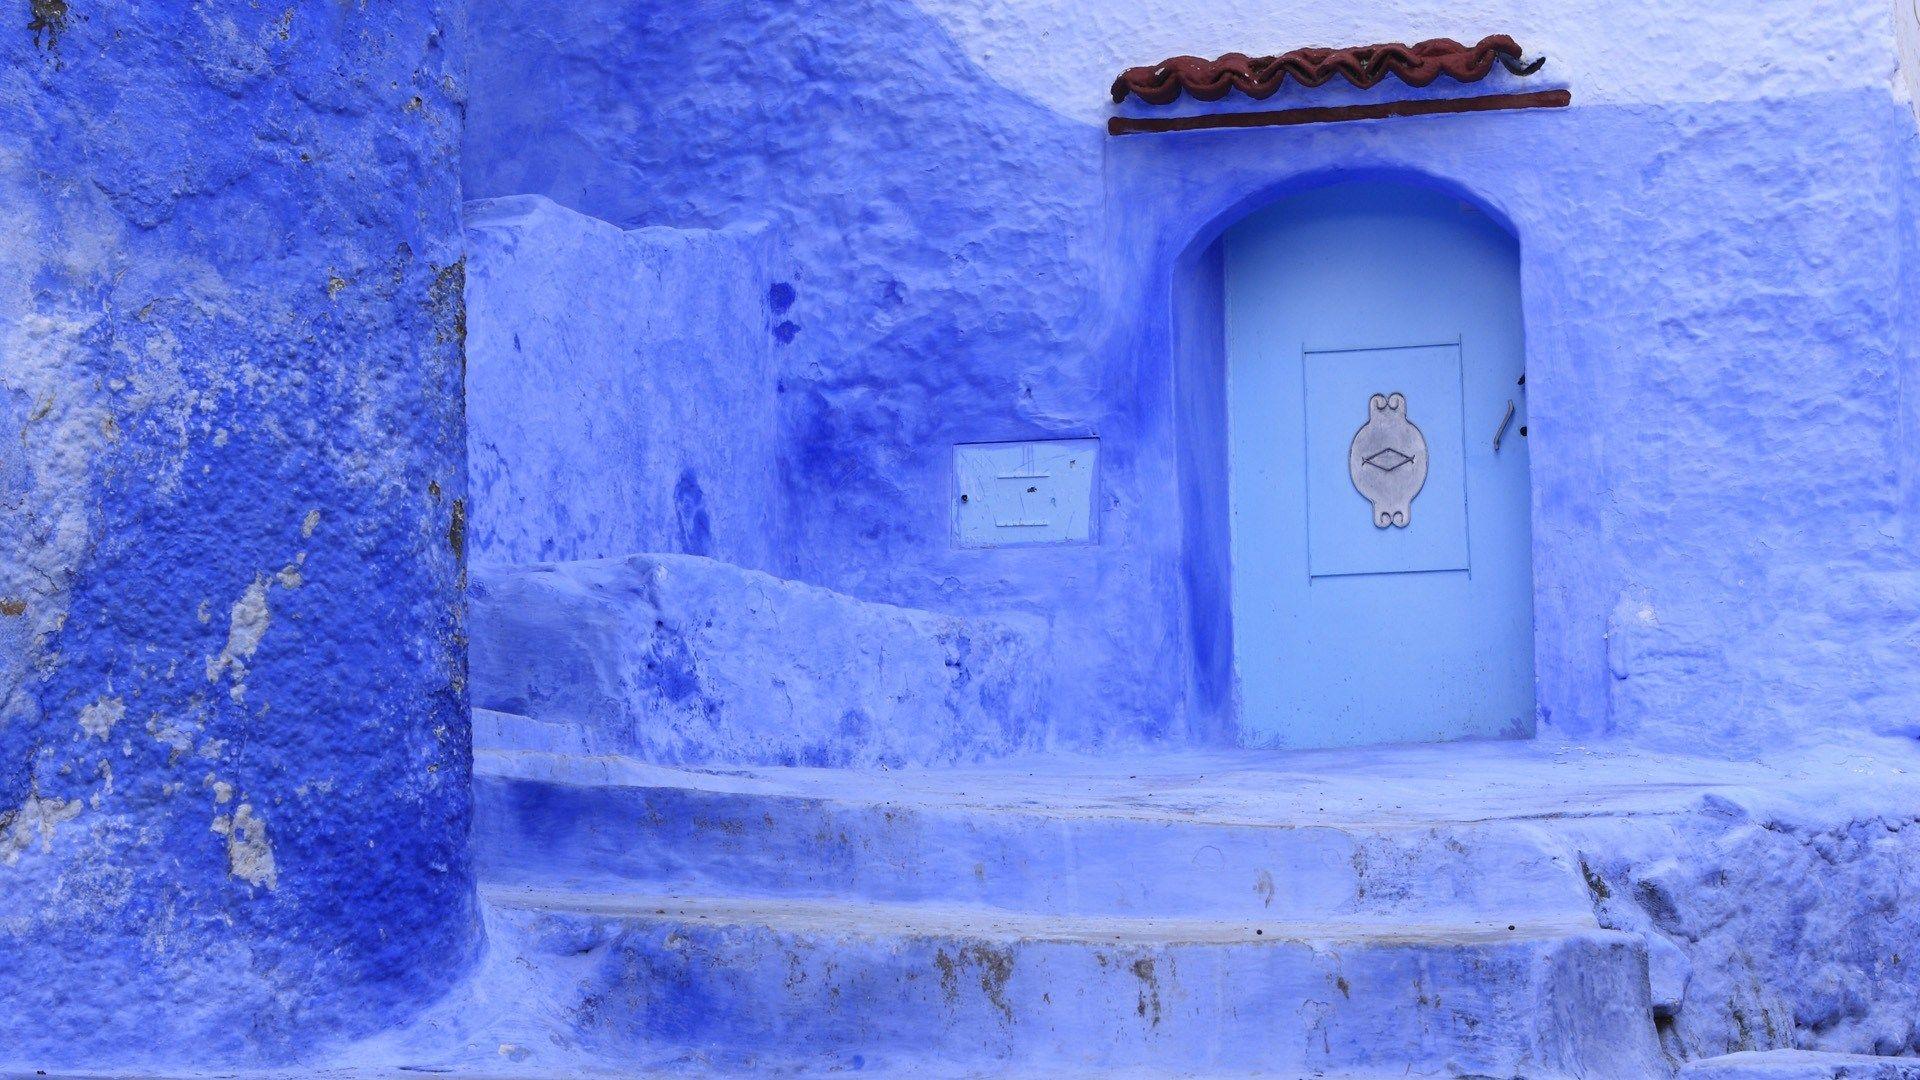 blue moroccan wallpapers hd sharovarka Pinterest